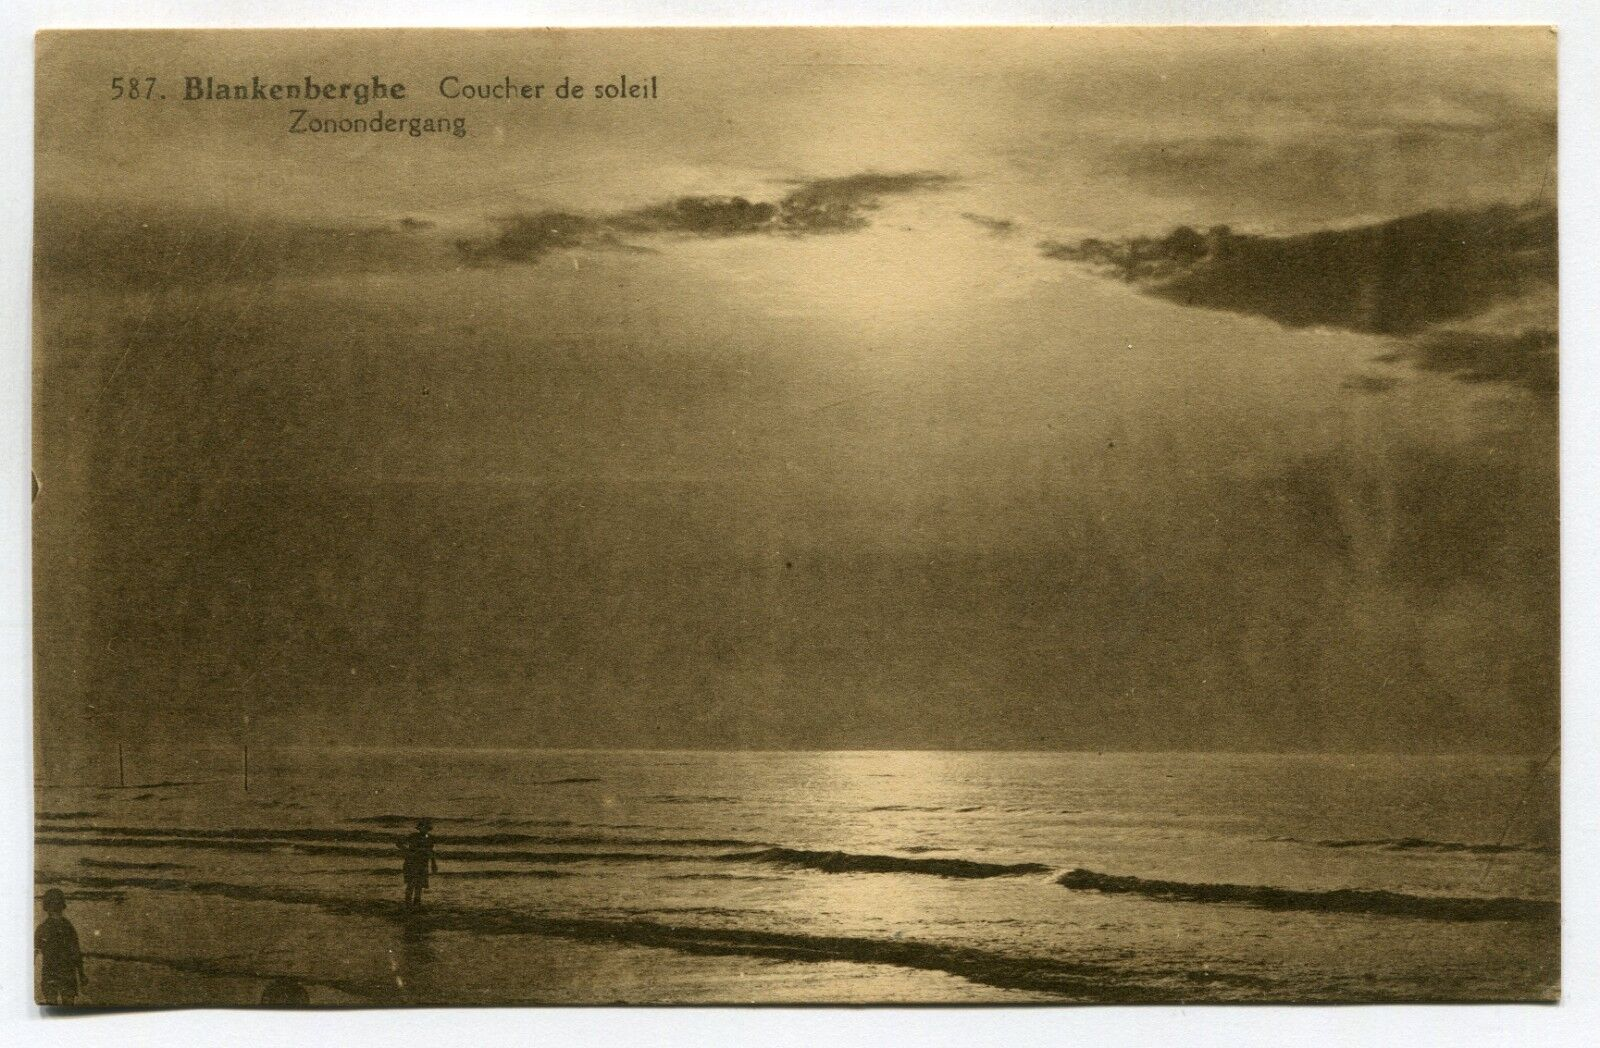 CPA - Carte Postale - Belgique - Blankenberge - Coucher de Soleil (SV6350)